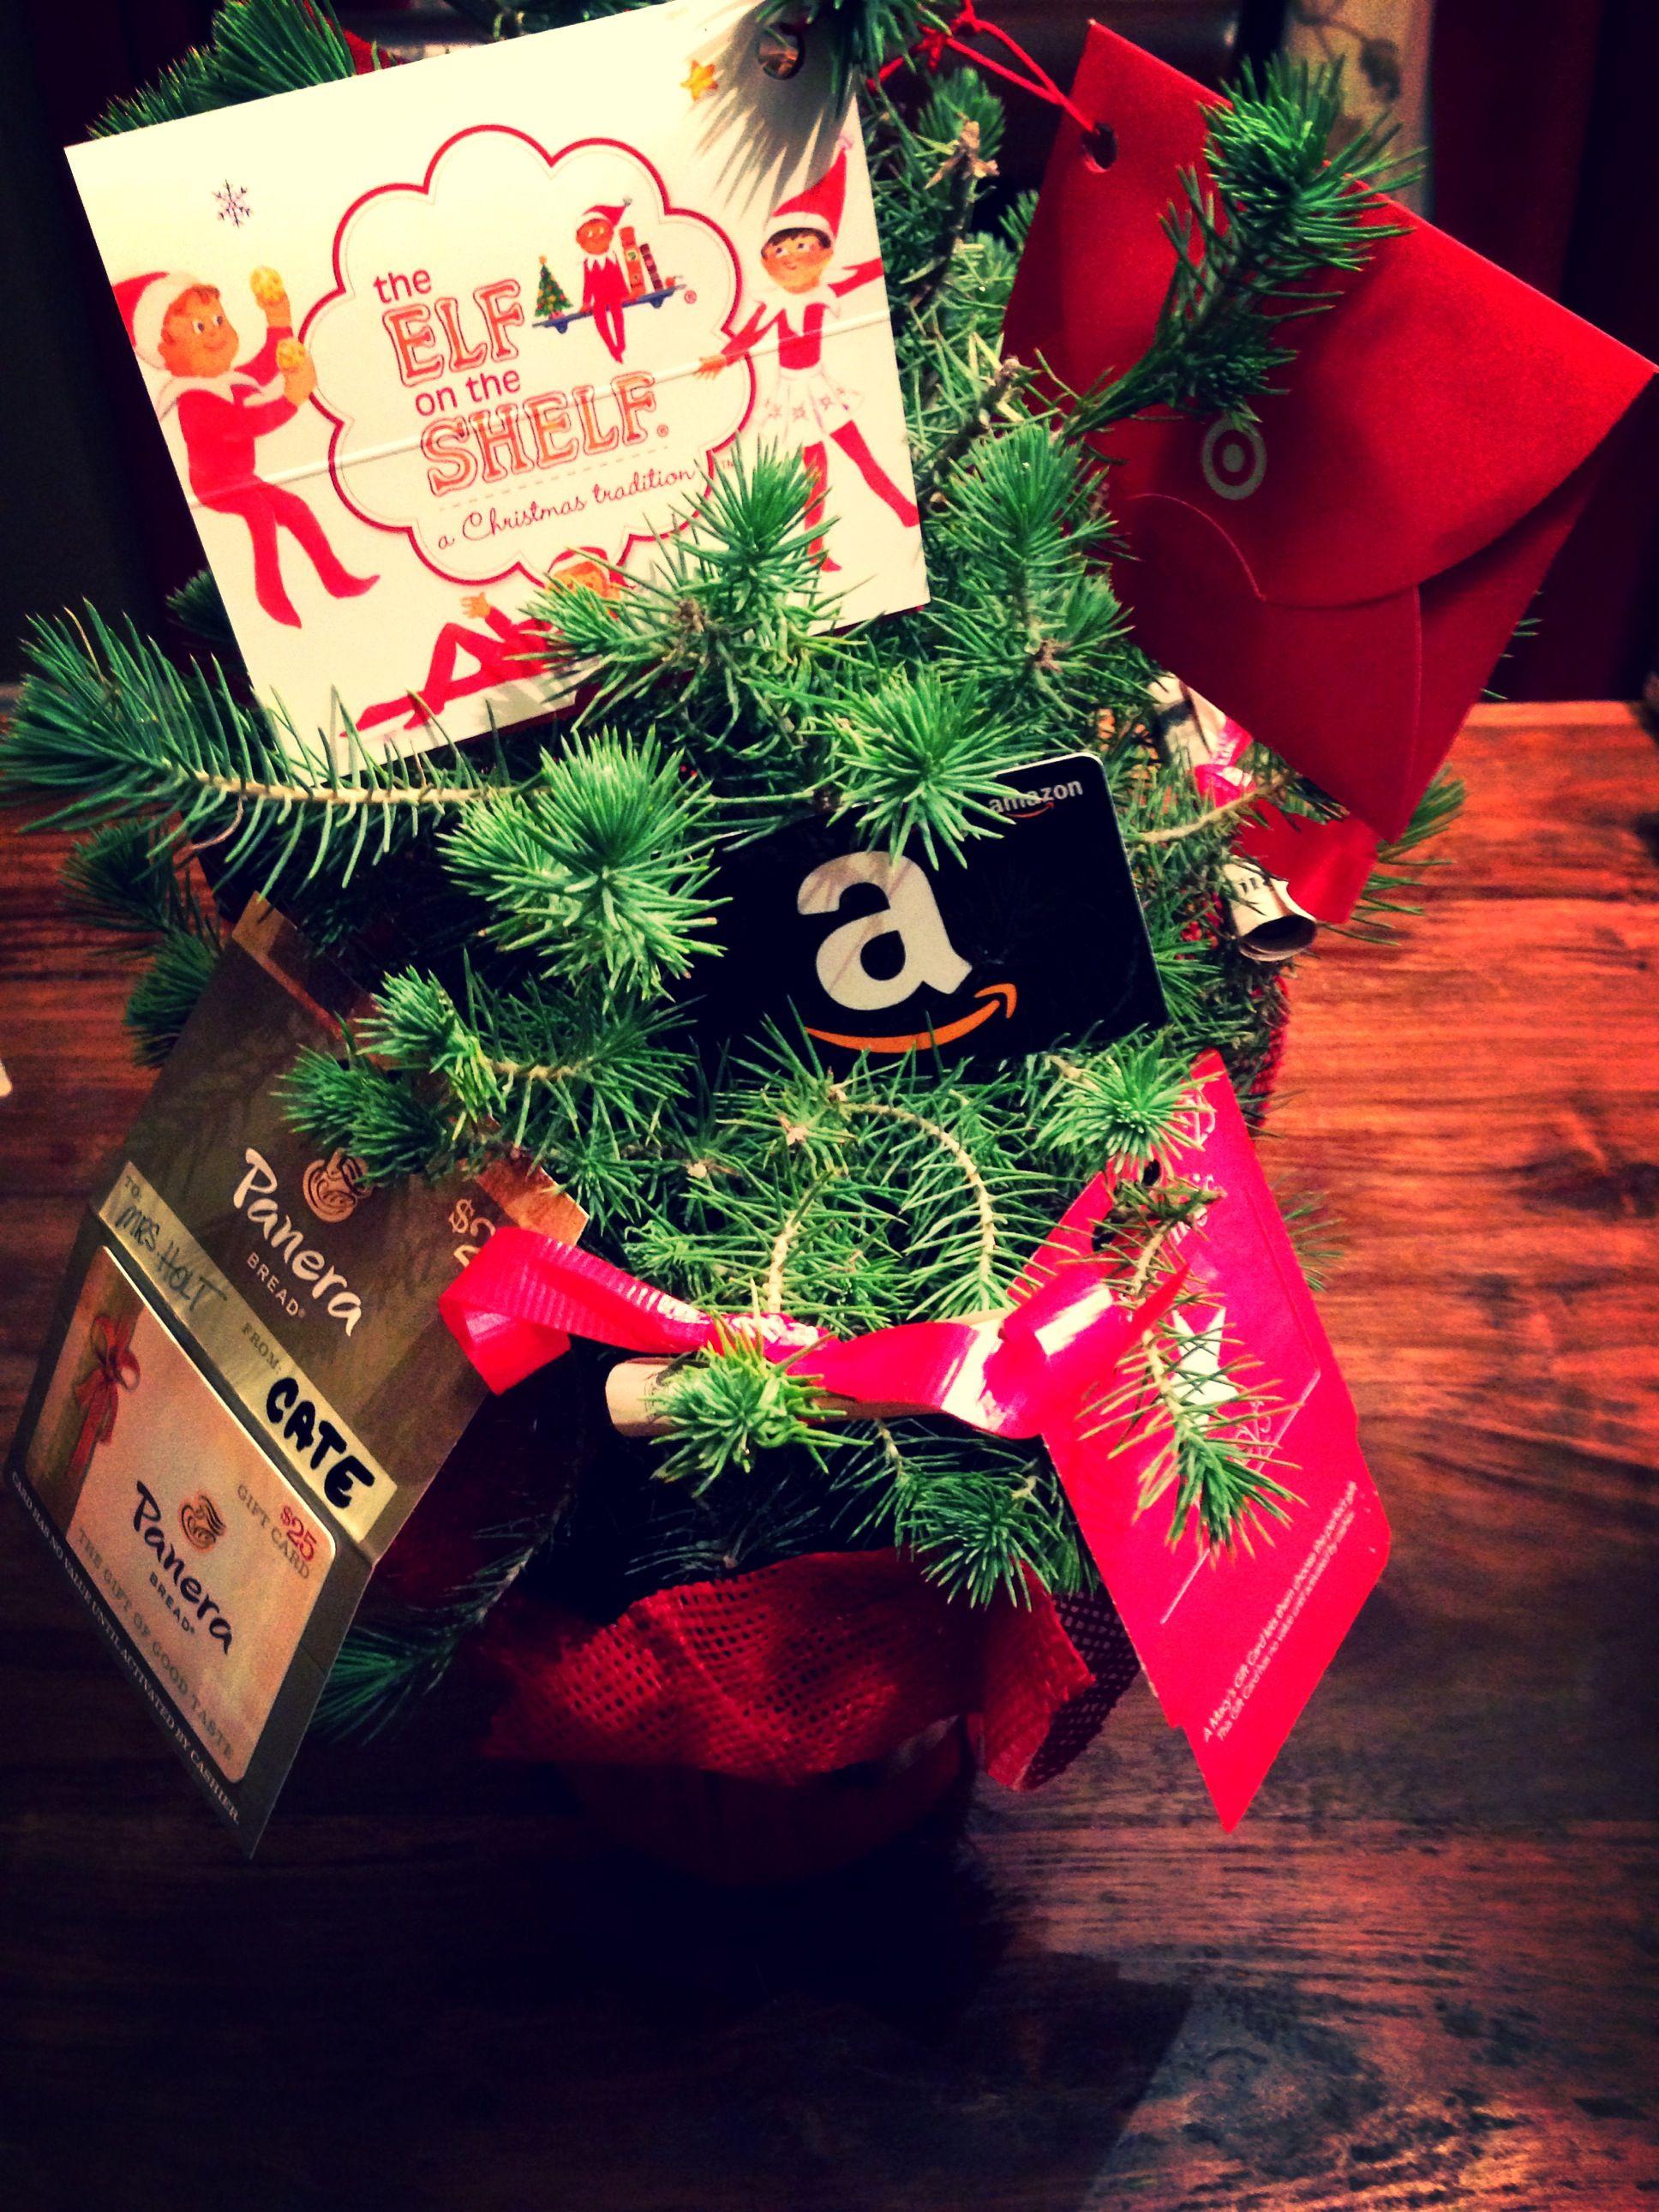 Holiday moneygift card tree for class teacher gift get a rosemary holiday moneygift card tree for class teacher gift get a rosemary tree or negle Gallery